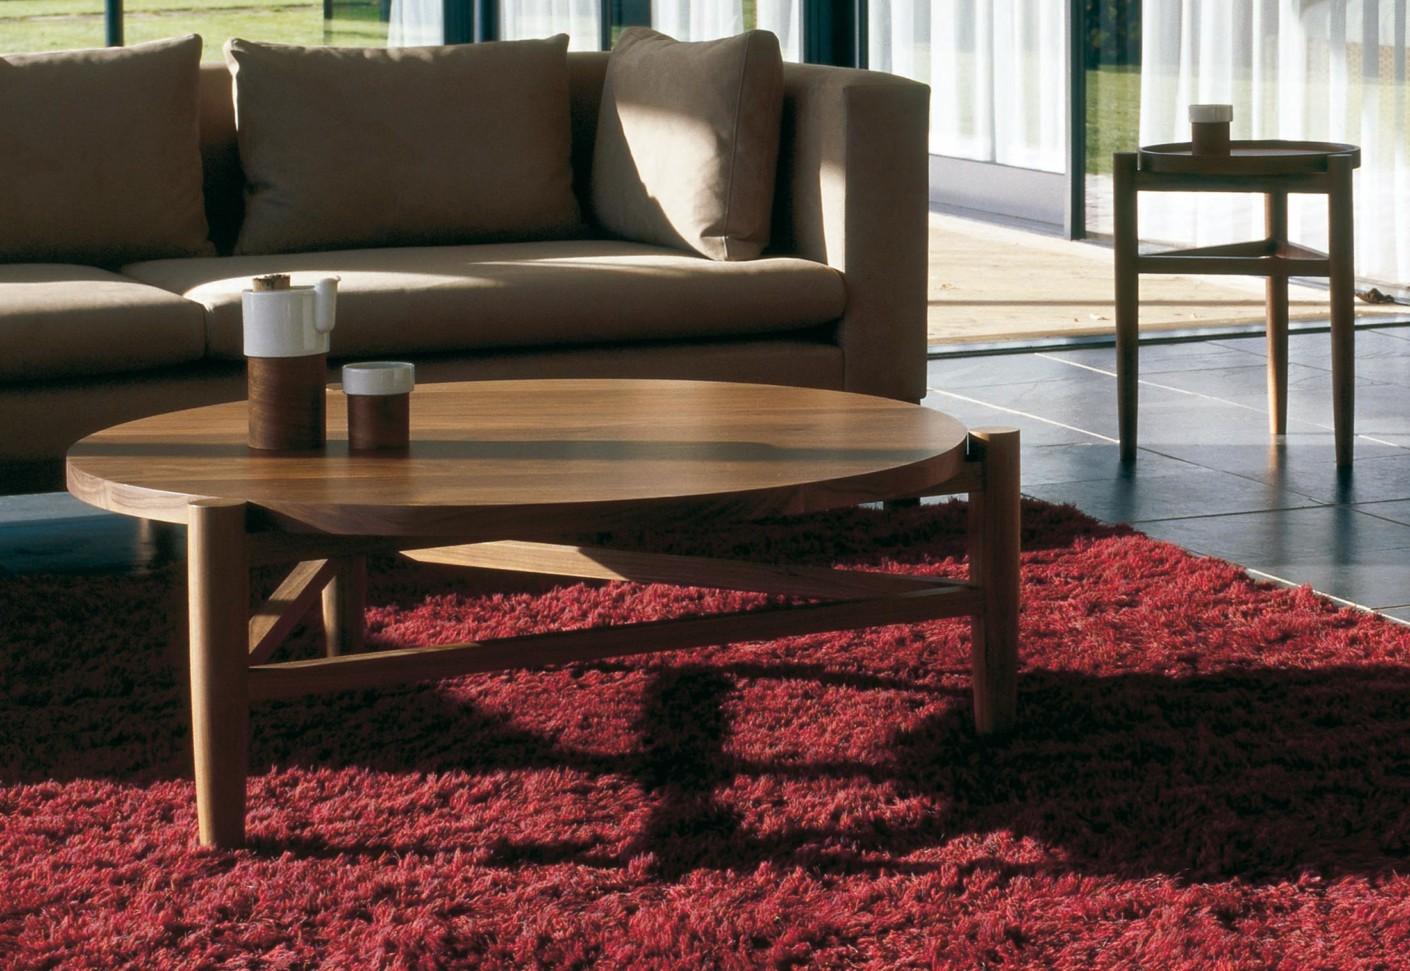 434 Luna Coffee Table By De La Espada Stylepark